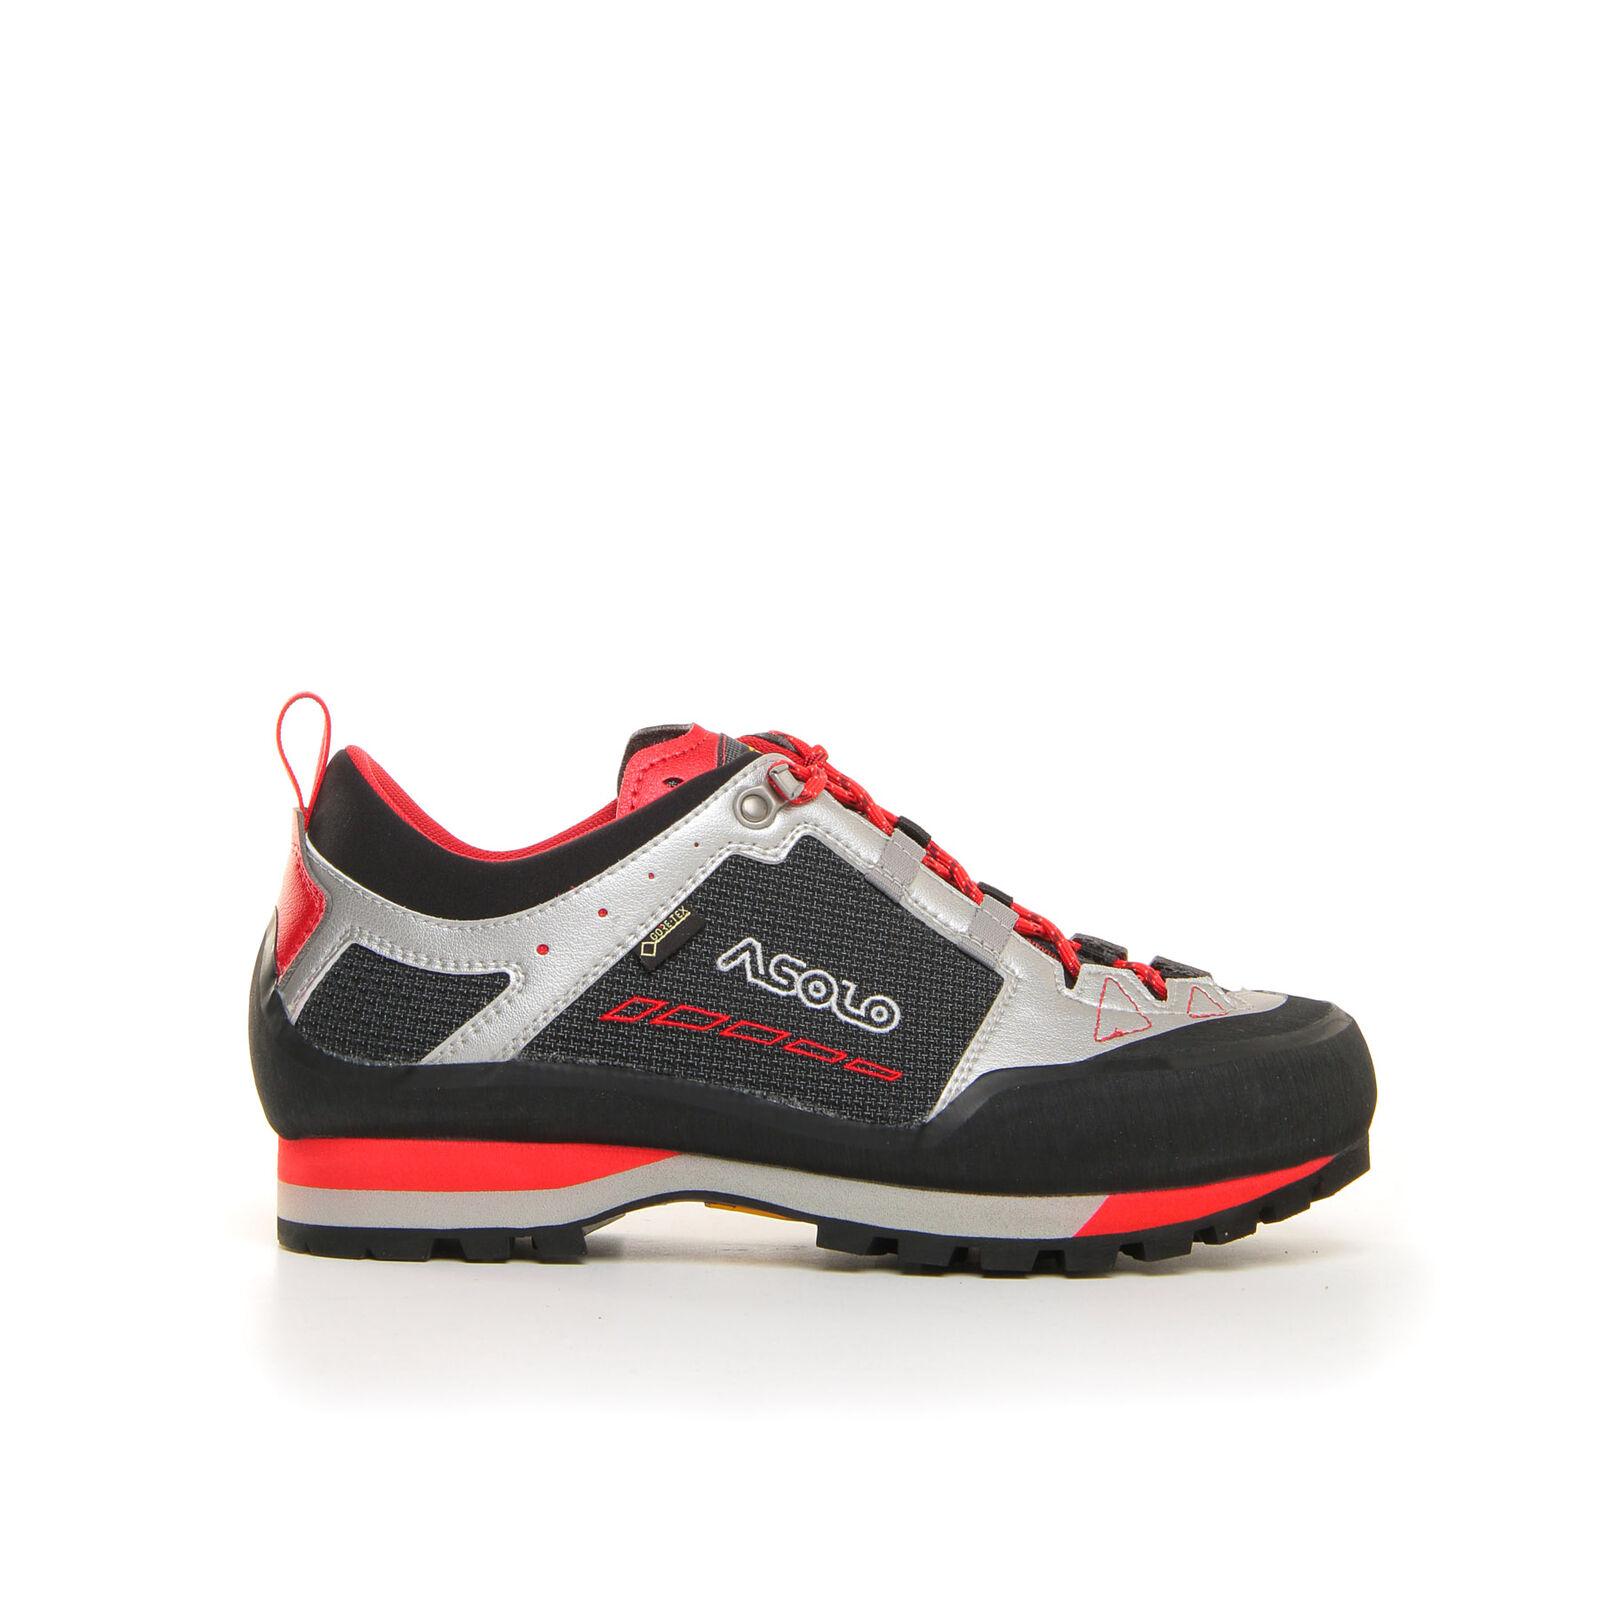 ASOLO FRENEY LOW shoes TREKKING men A01040 A386